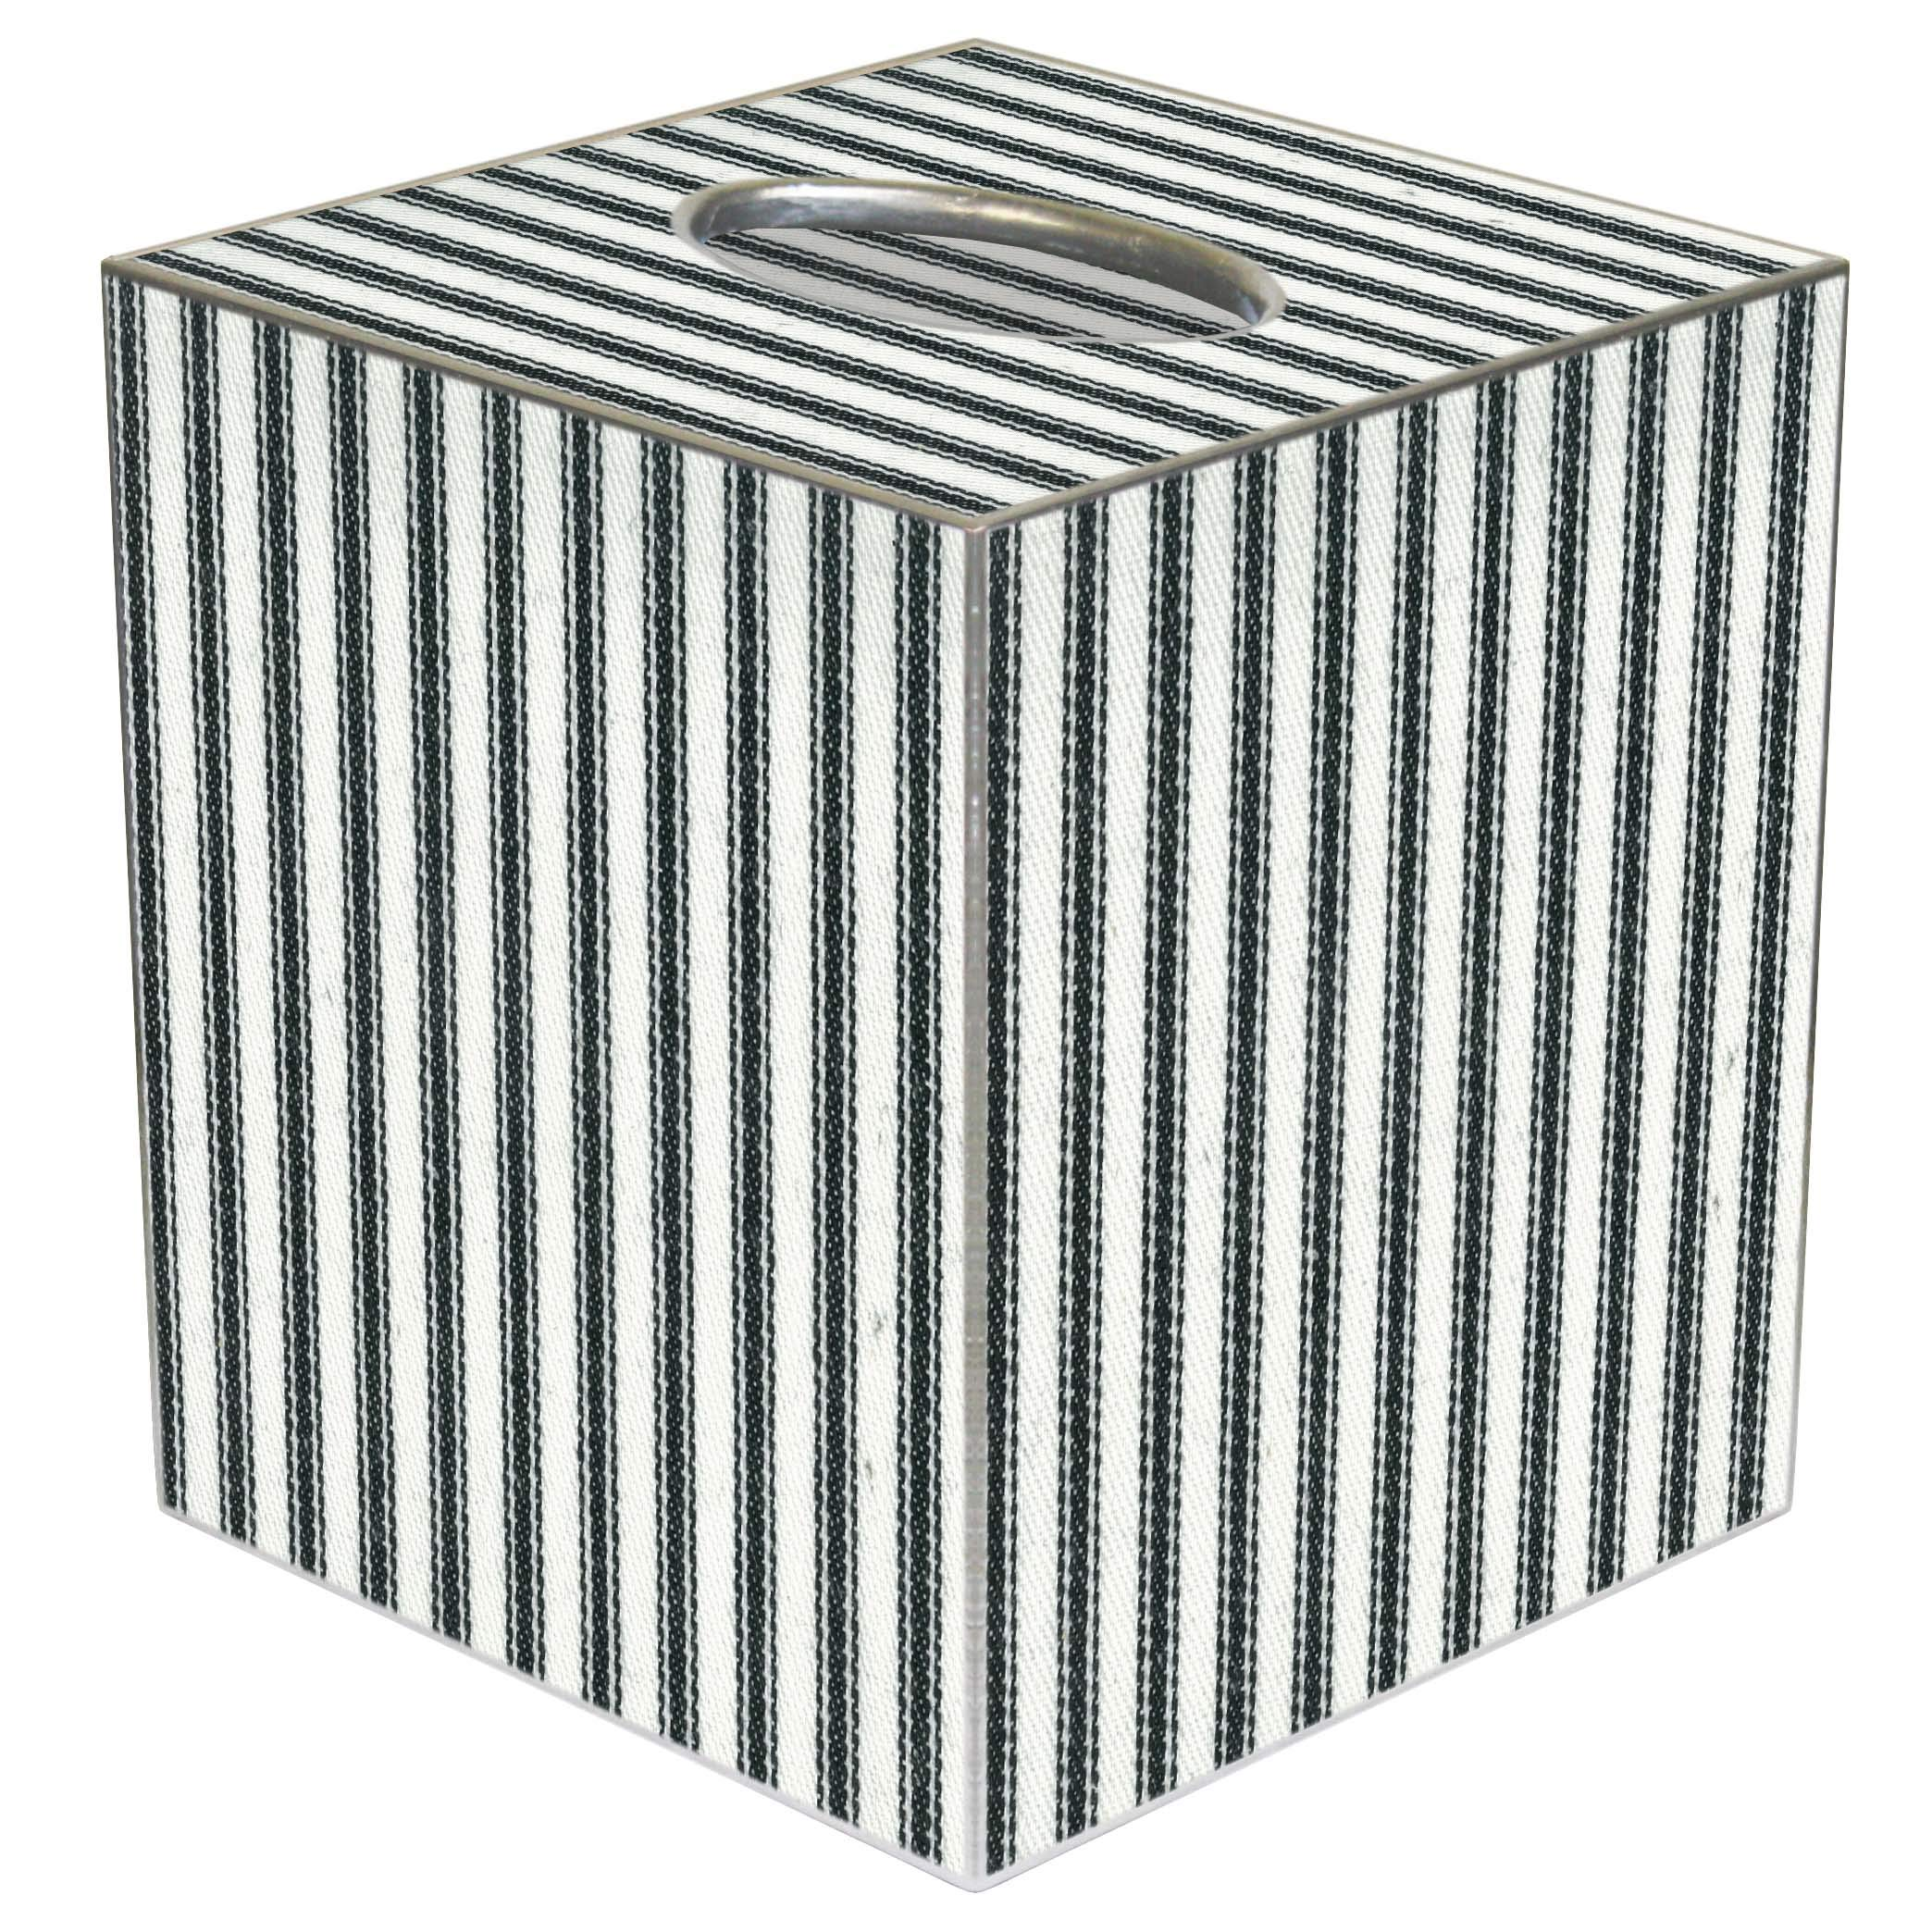 Tissue Box Cover Tissue Holder Square Cube Farmhouse Bathroom Decor Rustic Bathroom Decor Beach Decor Black Ticking Stripe 5'' x 5'' Fits Most